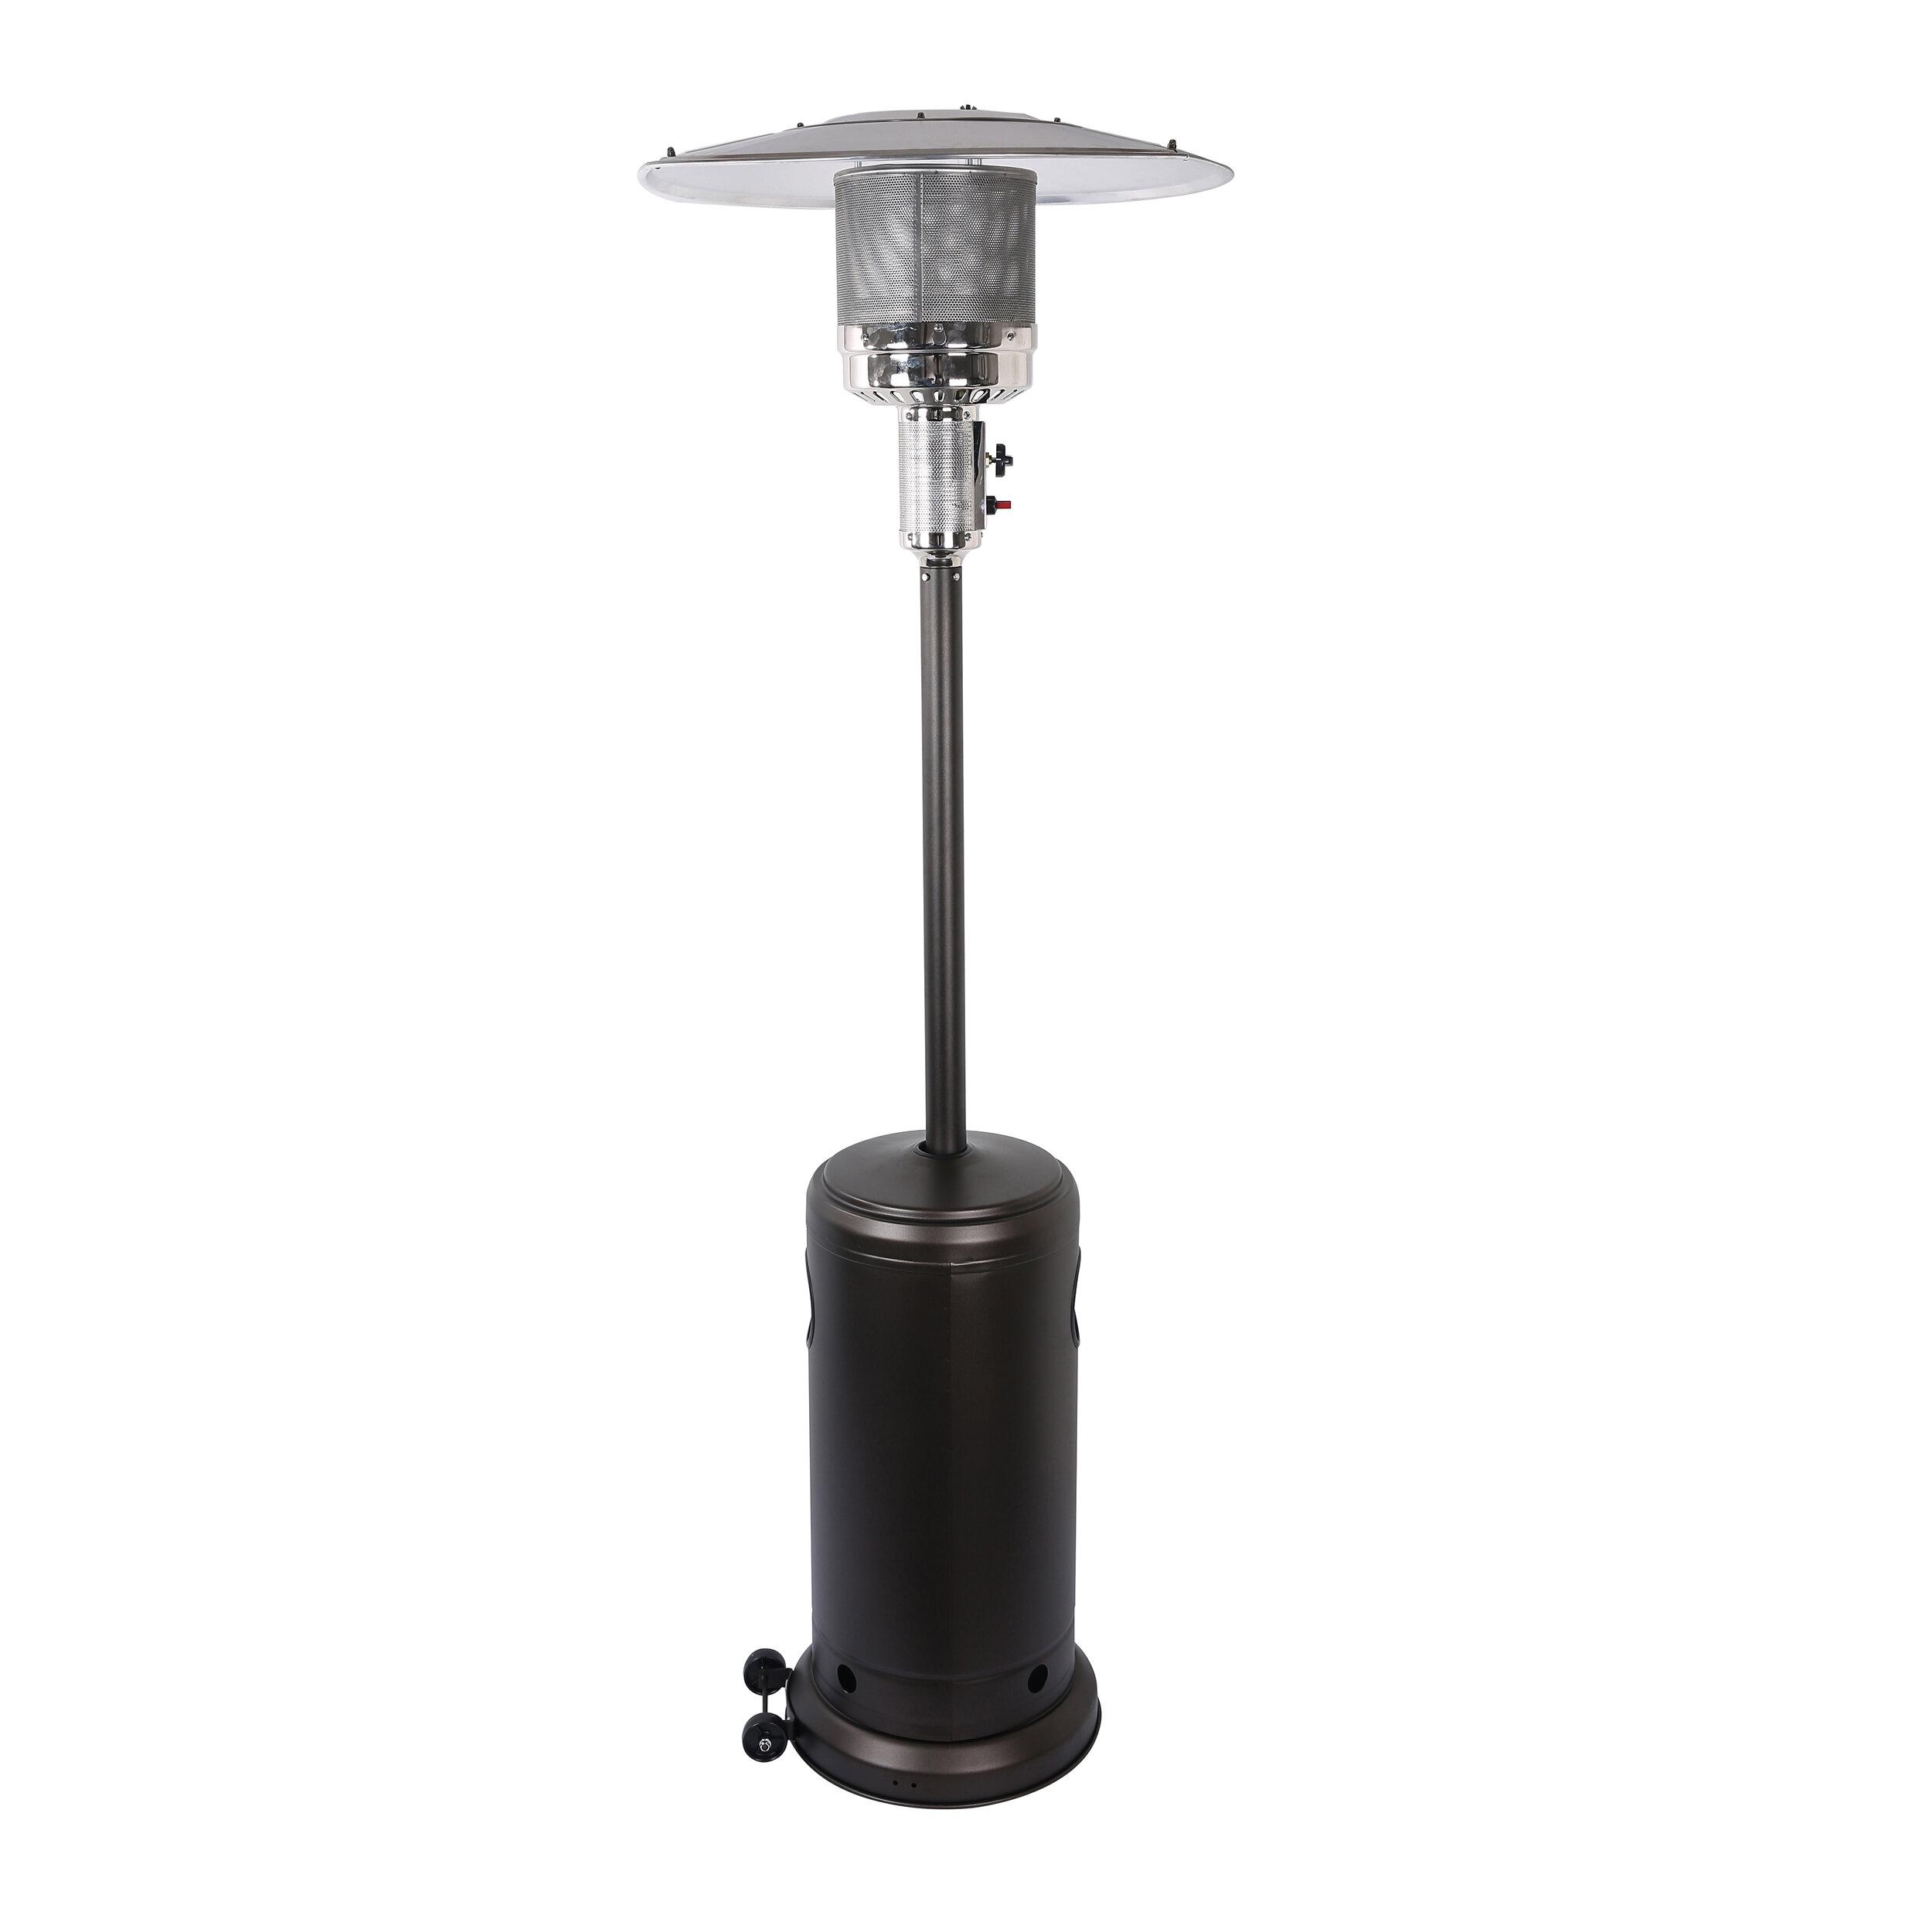 Propane patio heater Infrared Wayfair Azure Sky Outdoor 48000 Btu Propane Patio Heater Wayfair